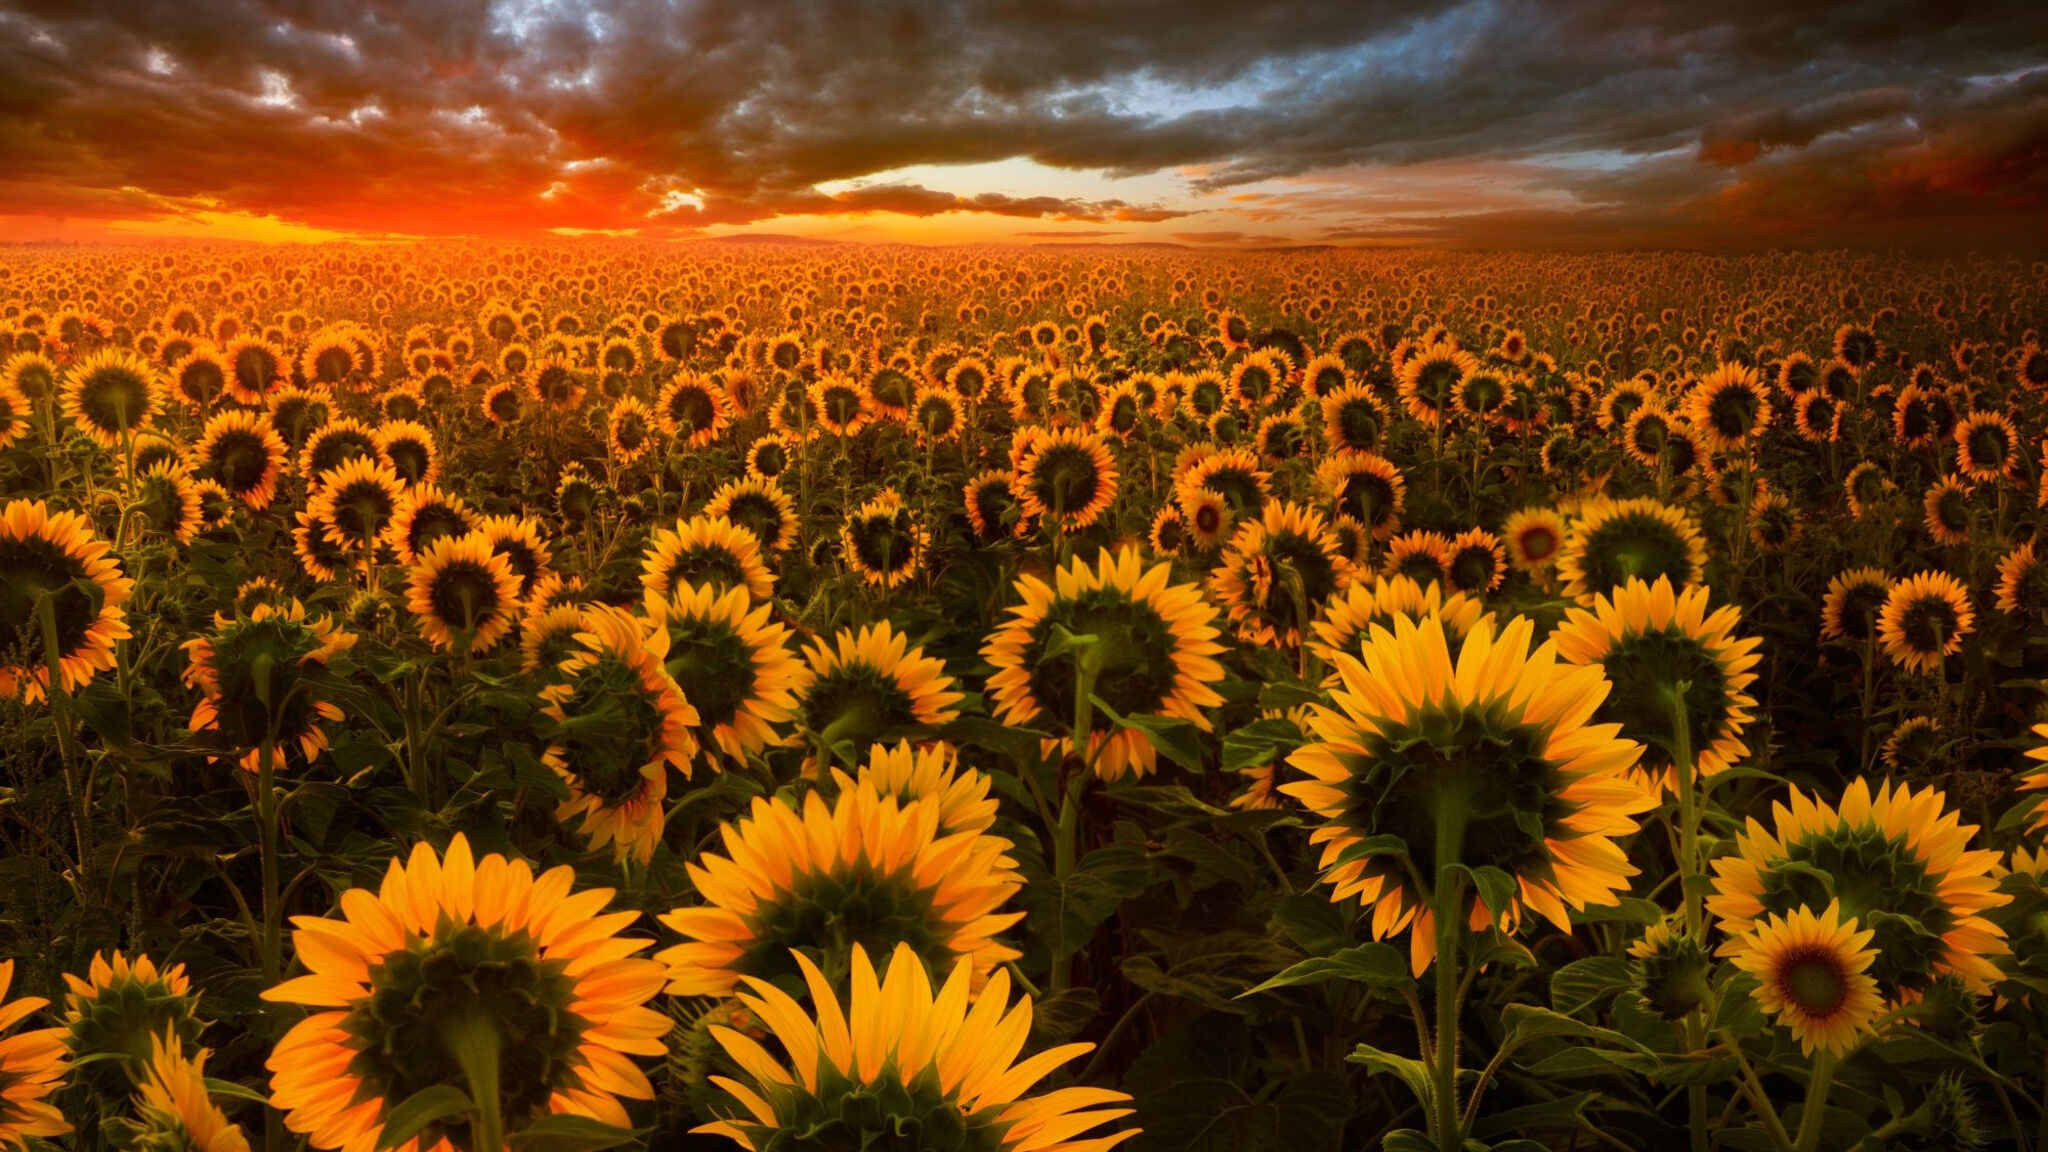 sunflower 8 wallpaper 1920x1080 - photo #43